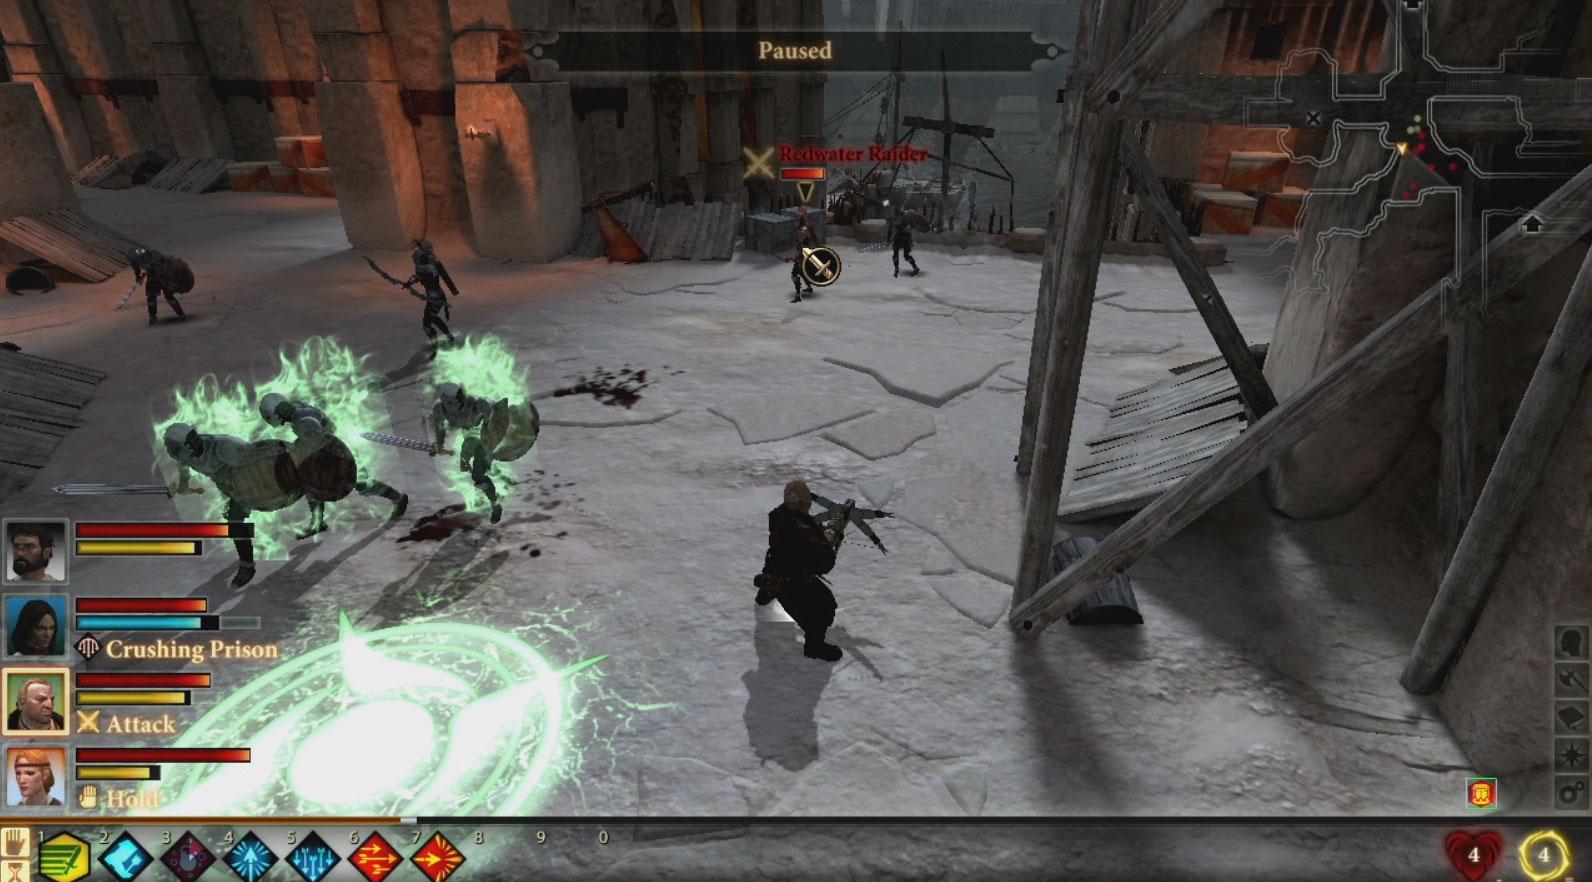 Dragon age: inquisition digital deluxe edition (2014) скачать.